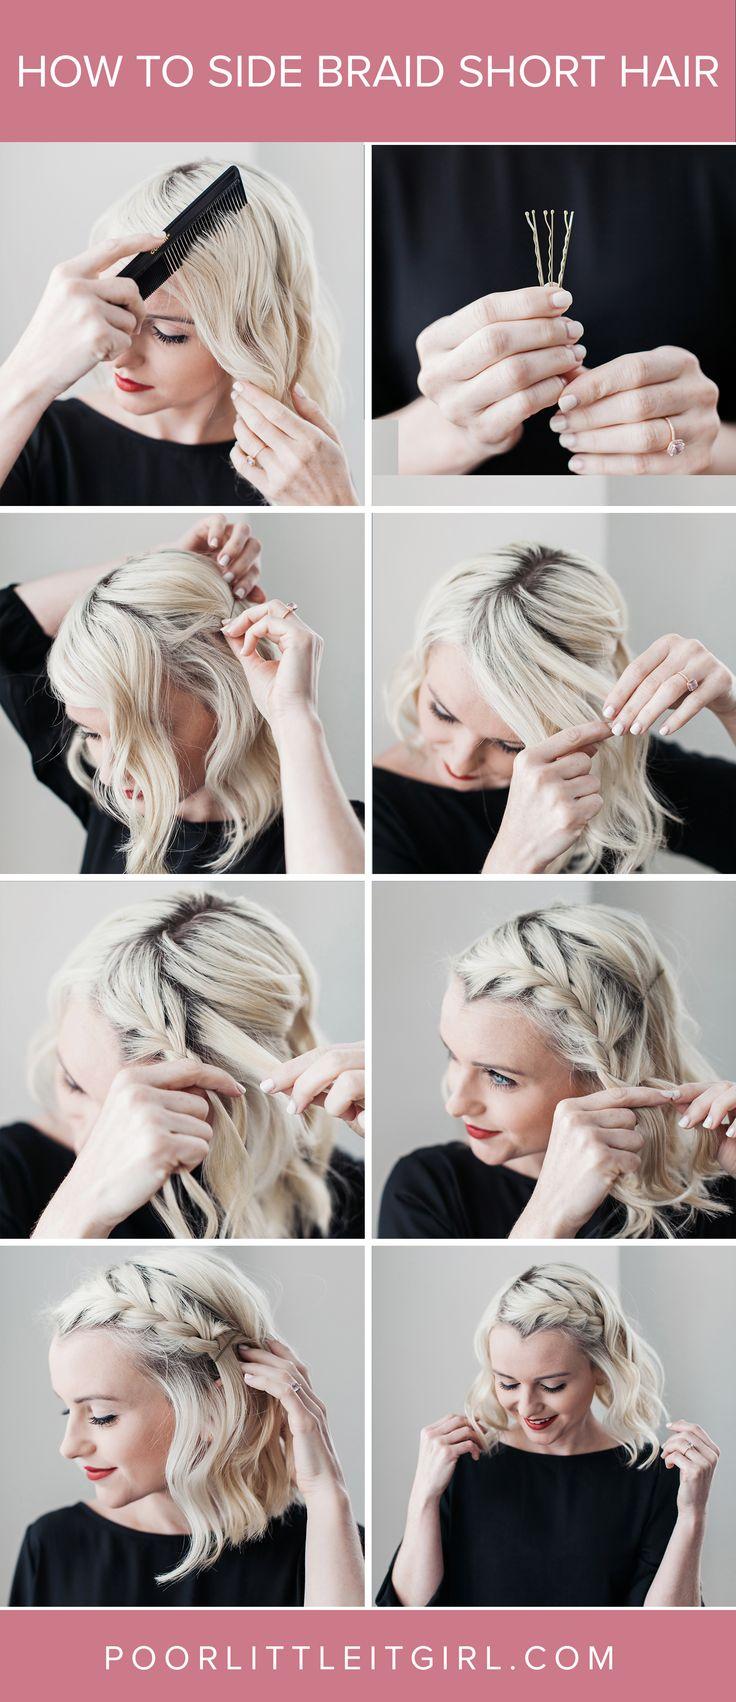 How To Side Braid Short Hair  Hair Tutorial  Braid  Poor Little It Girl